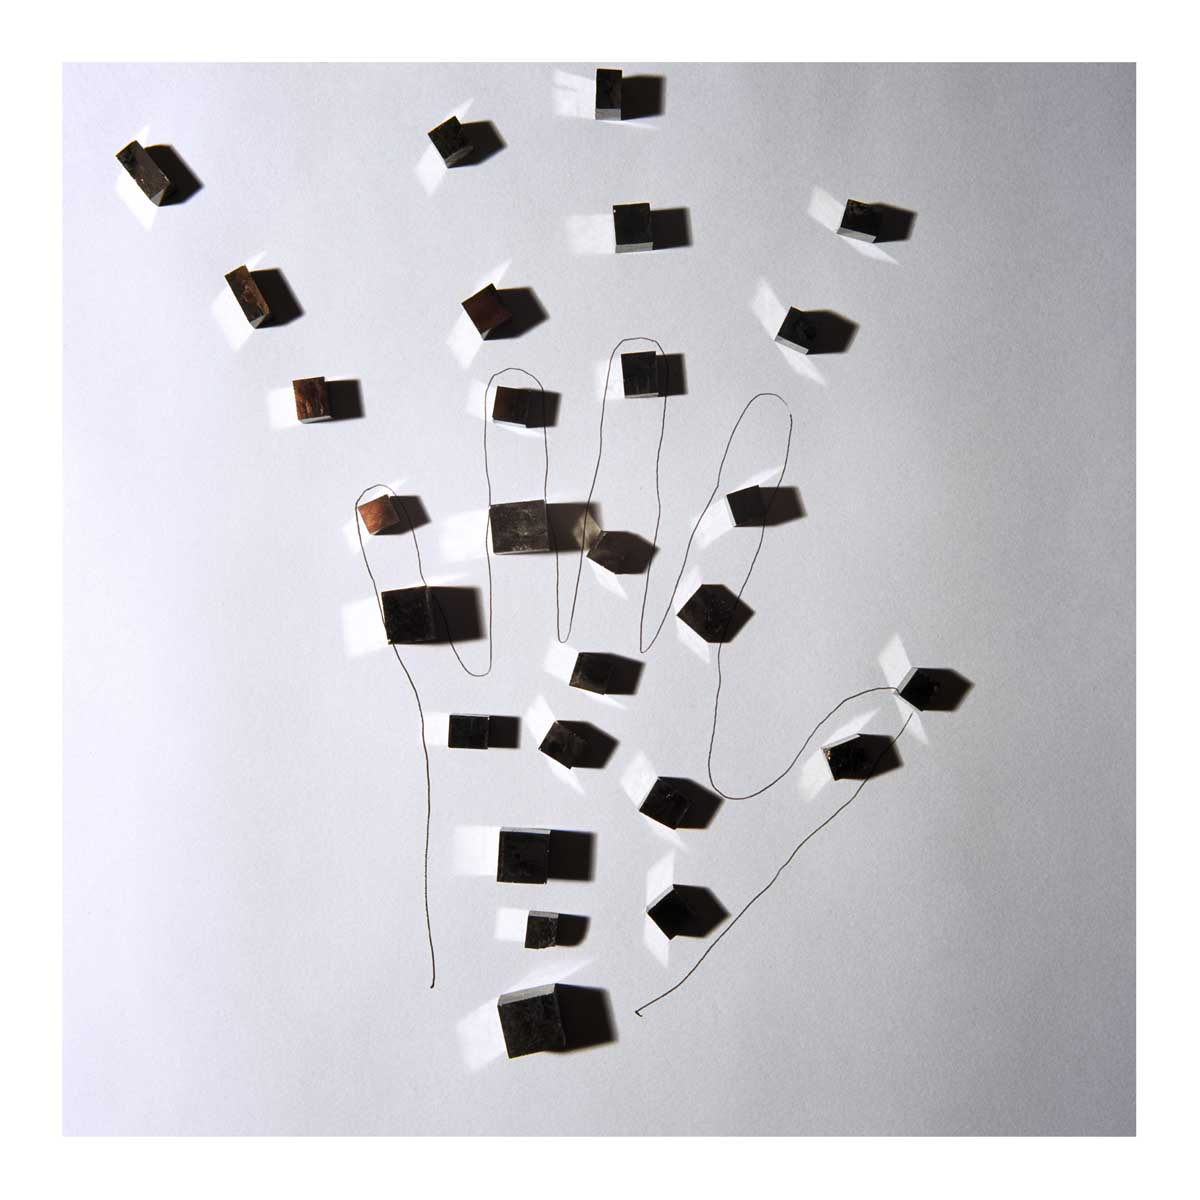 Joana Cera, Pyrite Hands, 2007